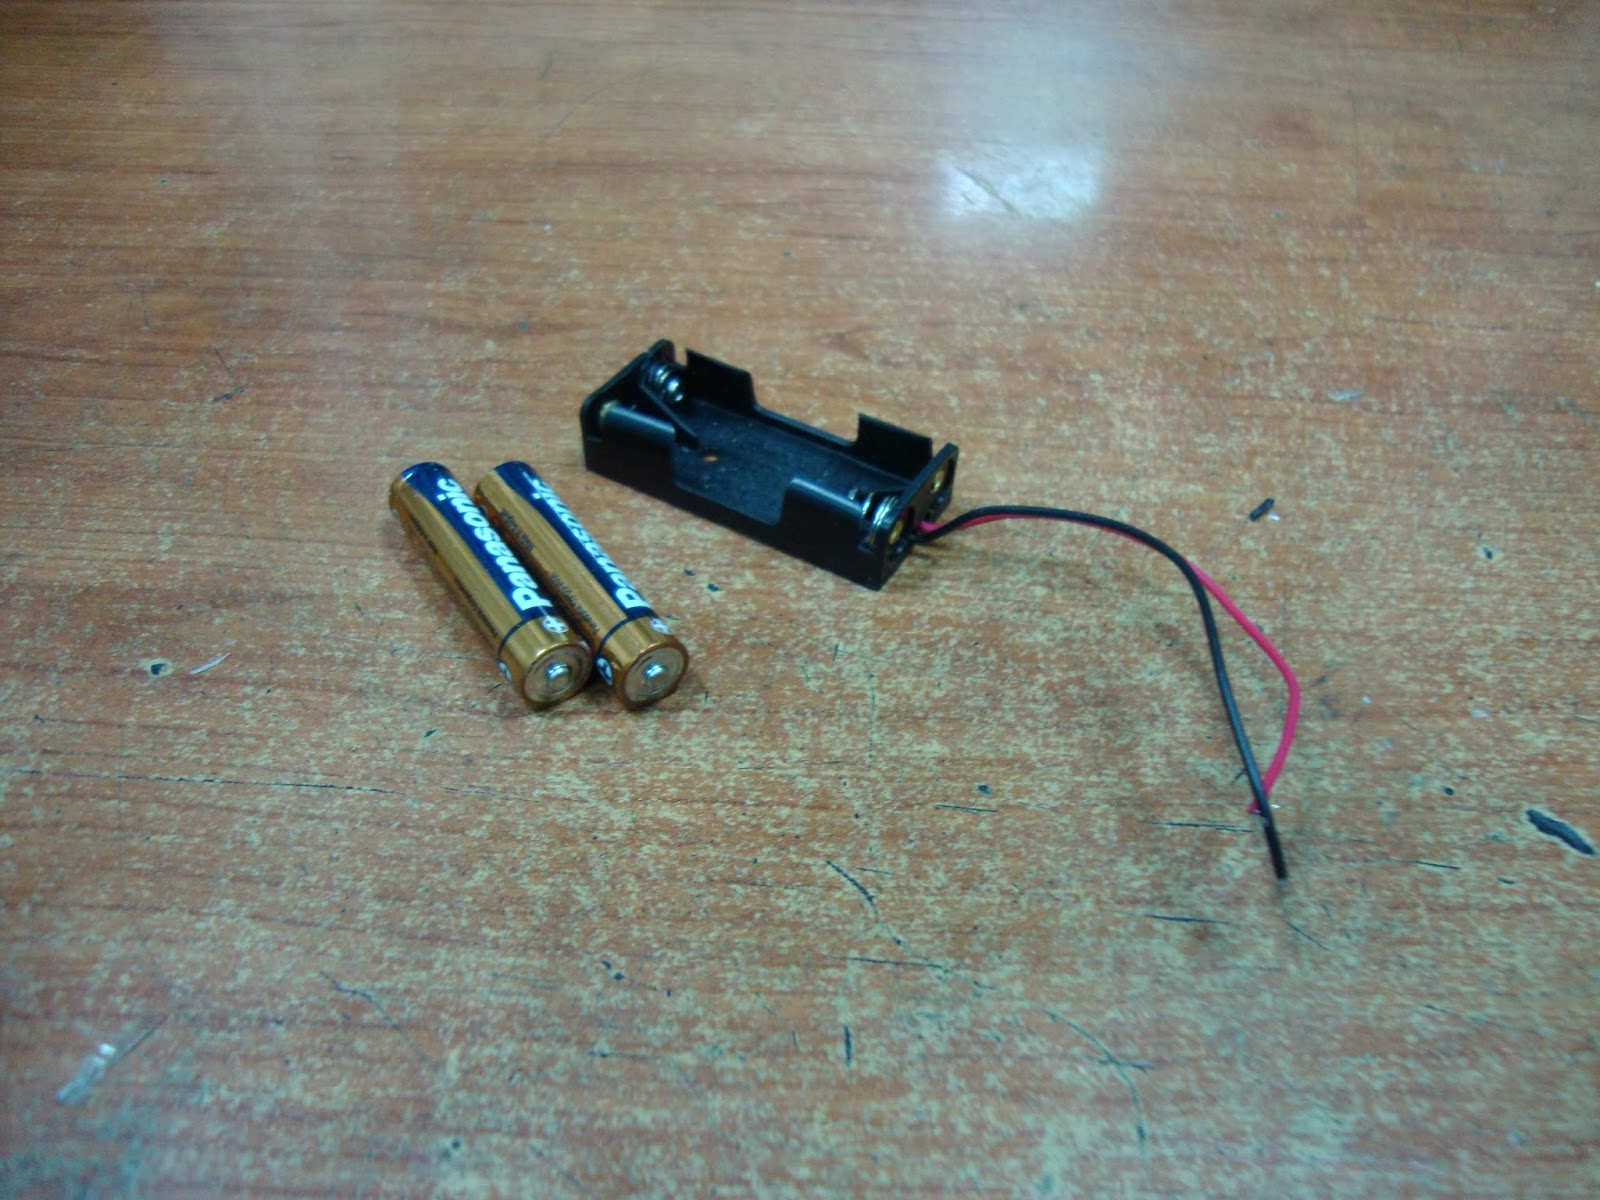 Wired 2-pin 3mm naranja Power LED cable PC cable señal luminosa diodo accionando el cable